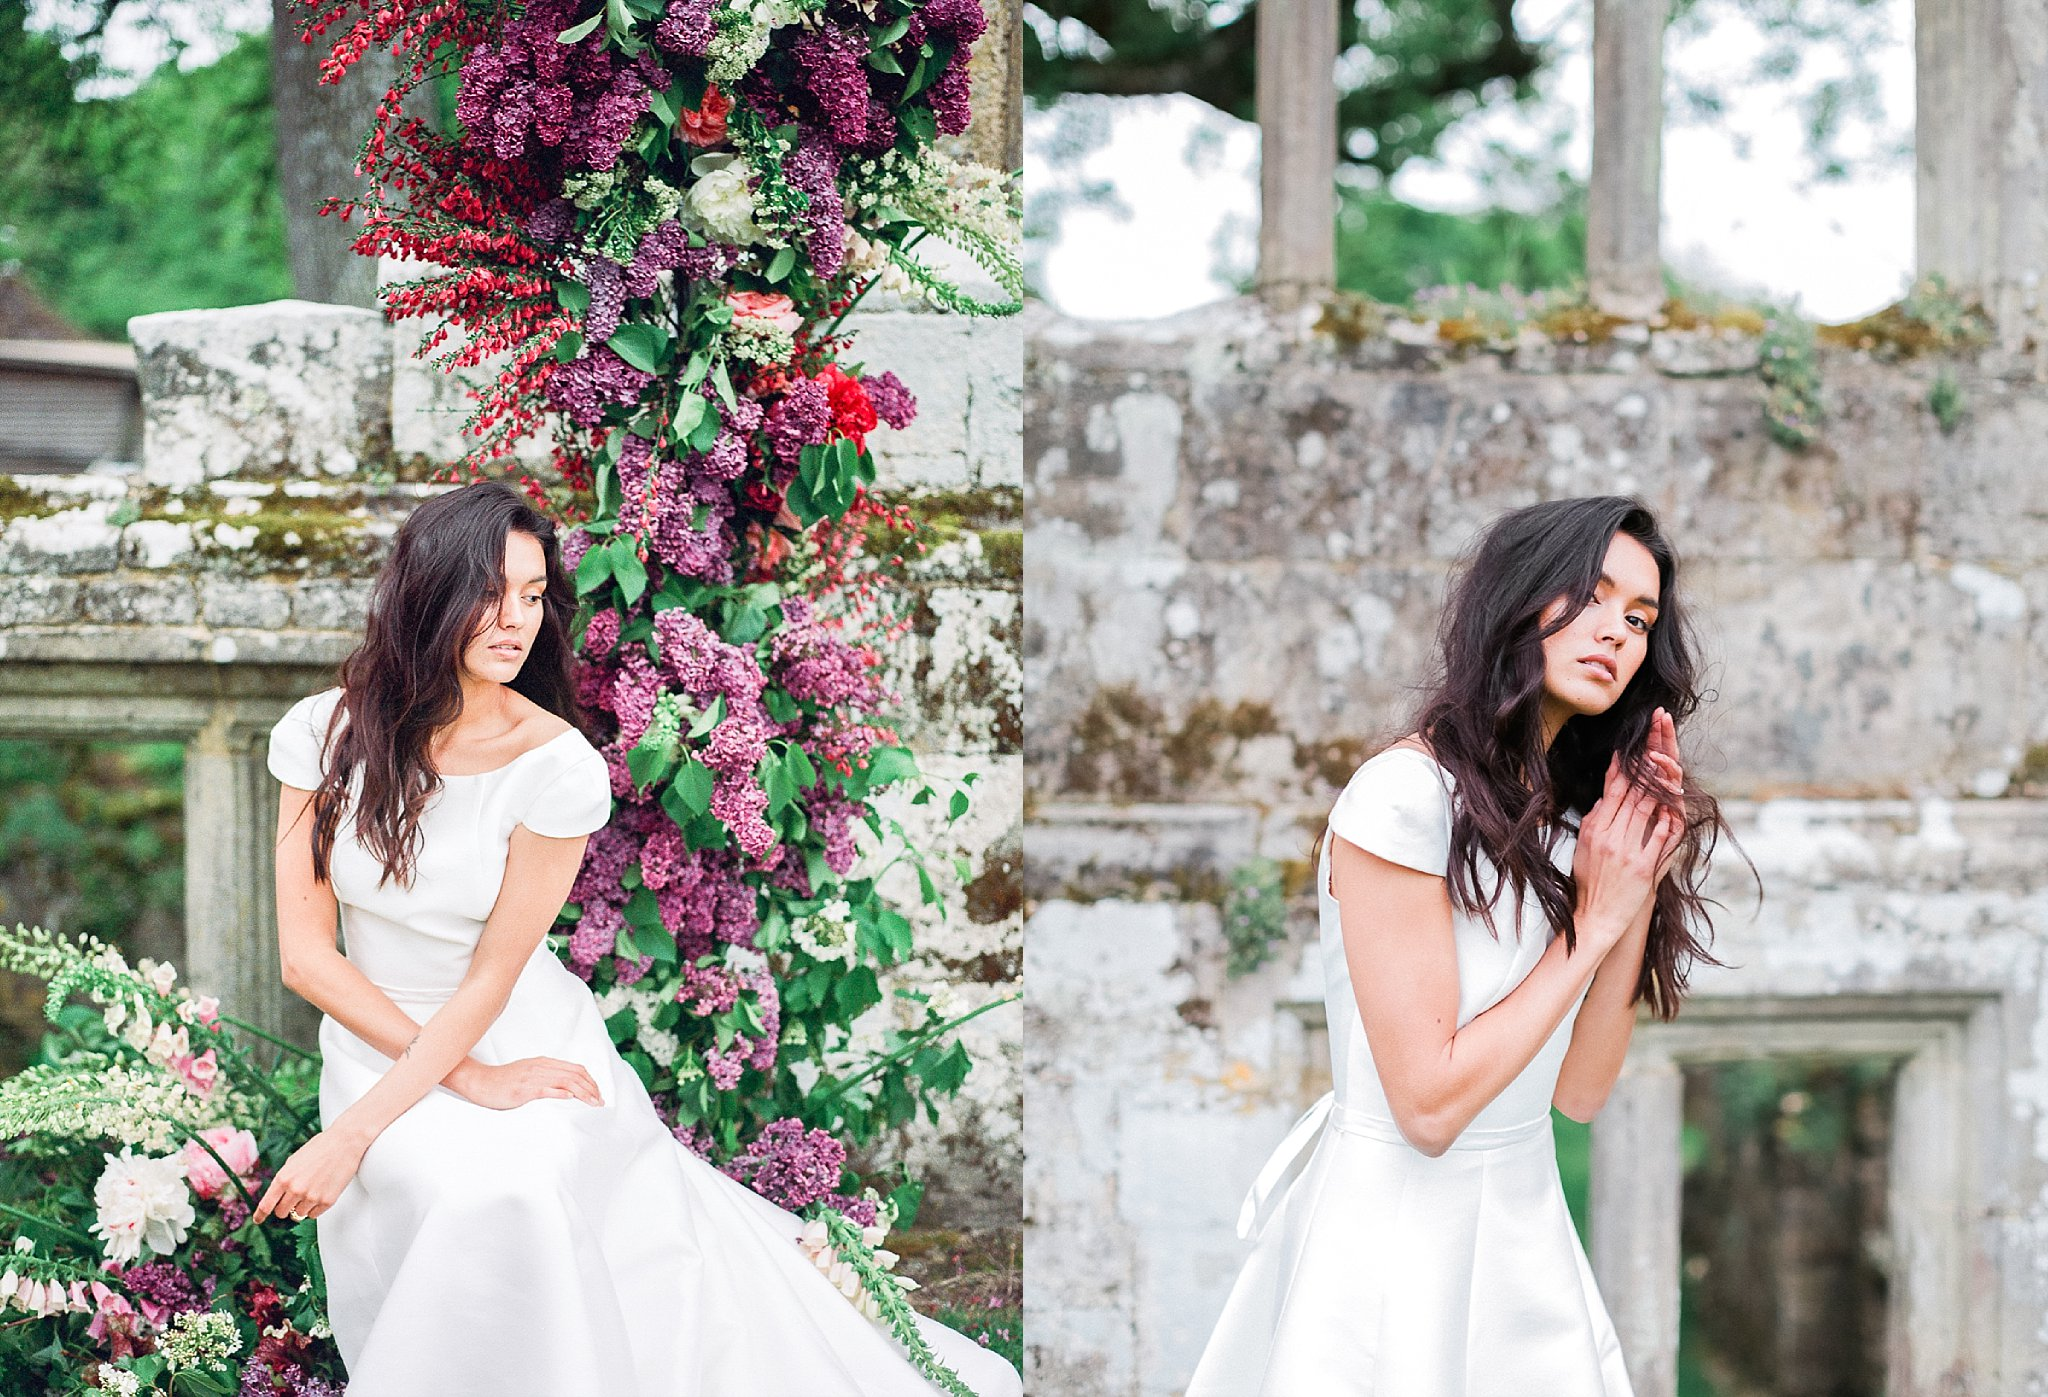 Destination Wedding Photographer,Fine Art Wedding Photographer,Kylee Yee,Kylee Yee Photography,London Wedding Photographer,Wedding and Portrait Photographer,